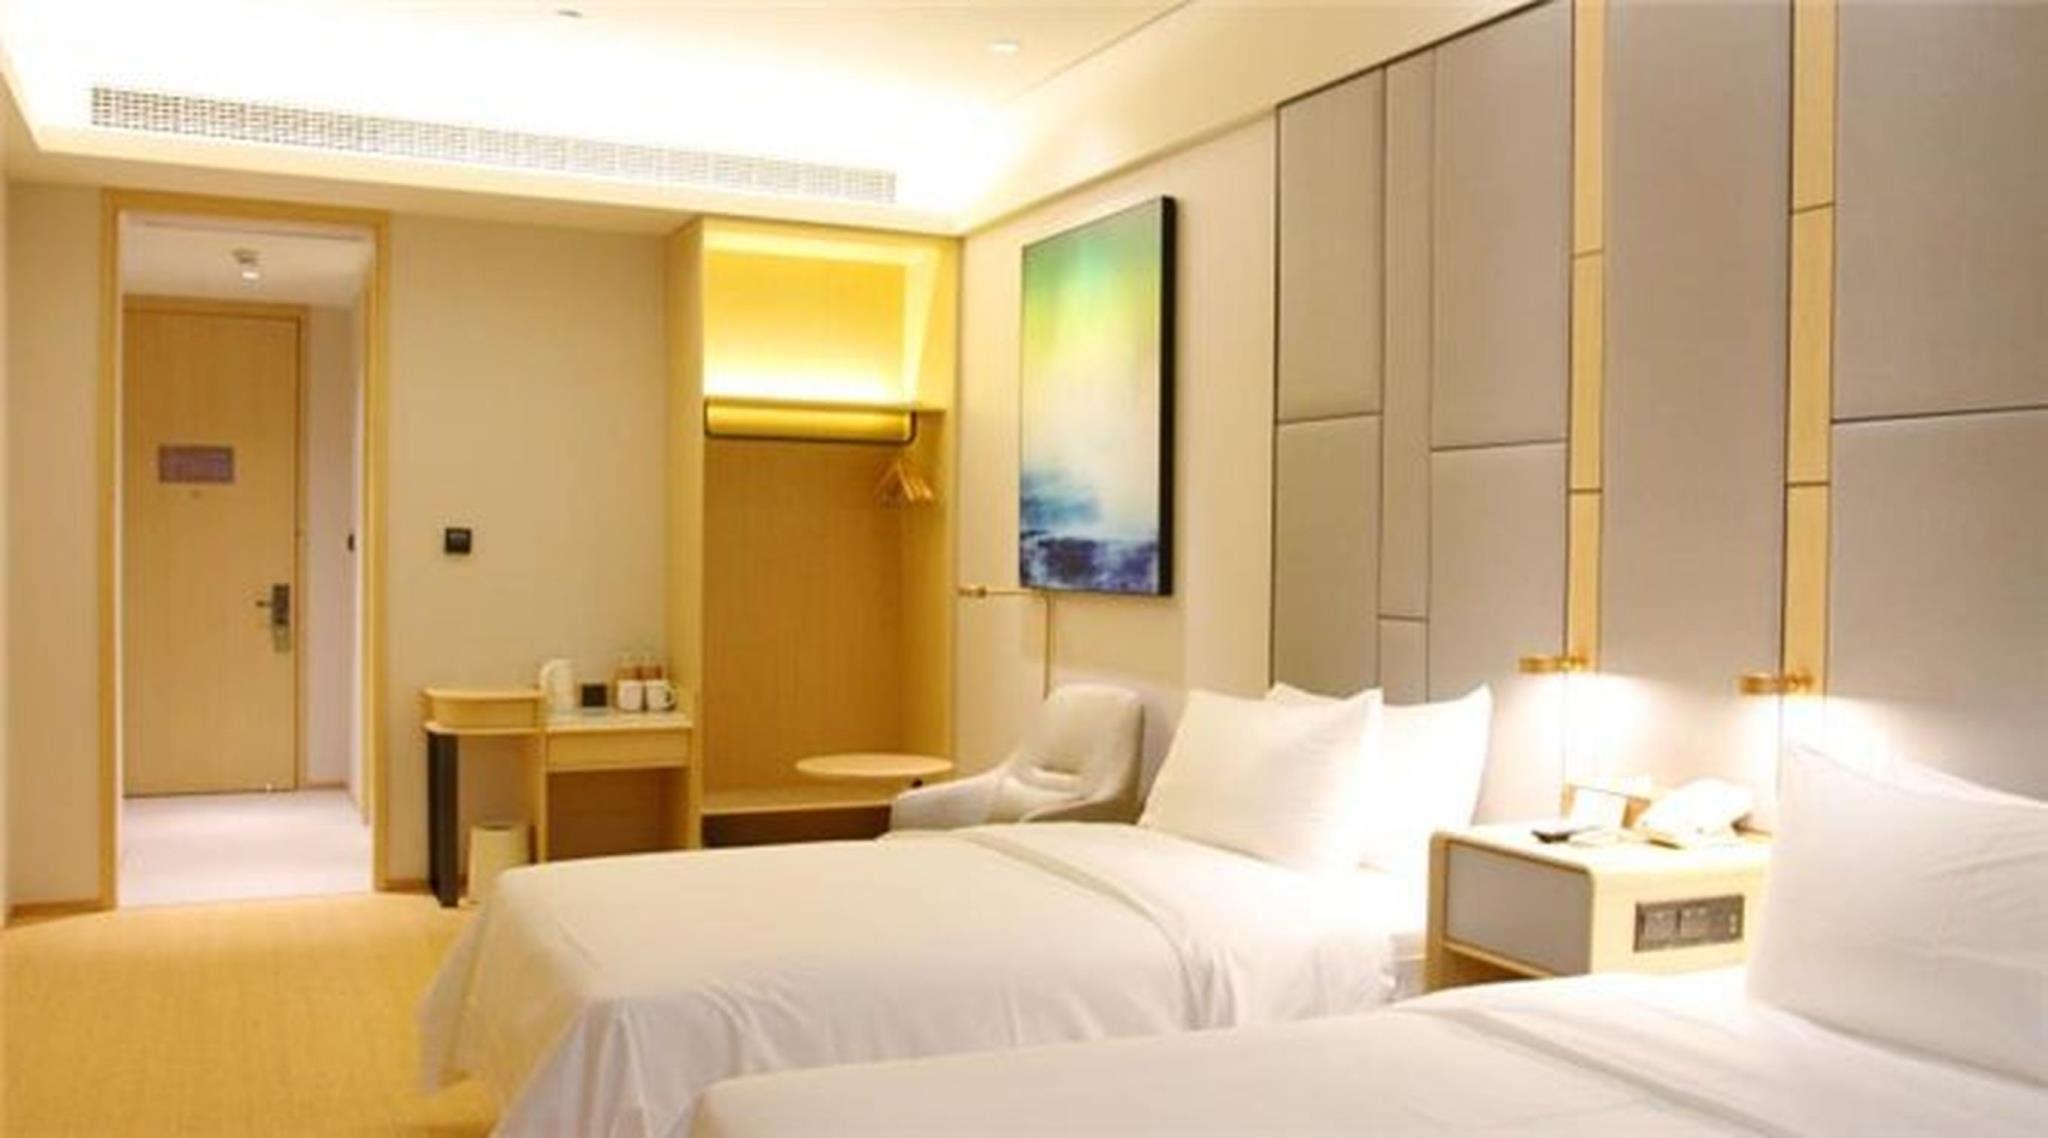 Price JI Hotel Anji Shengli West Road